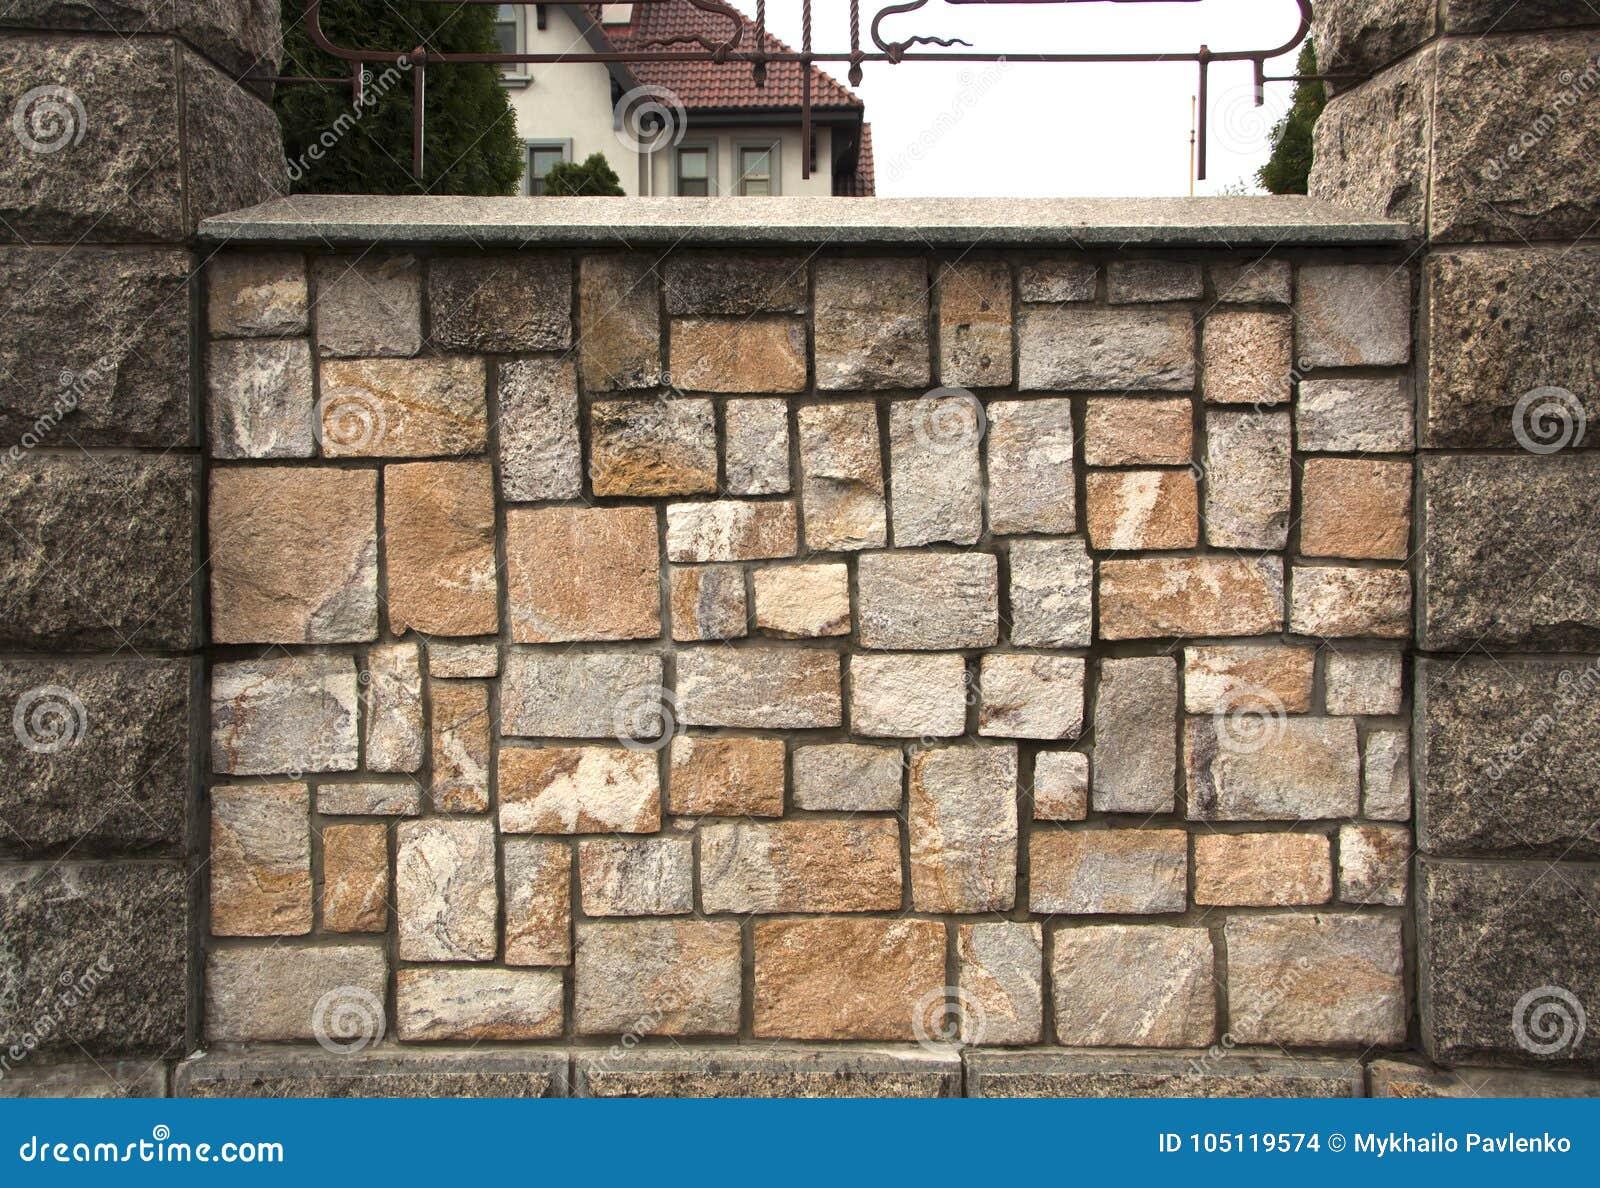 best ideas block decor walls patternscolors concrete ozinga various blocks for decorative